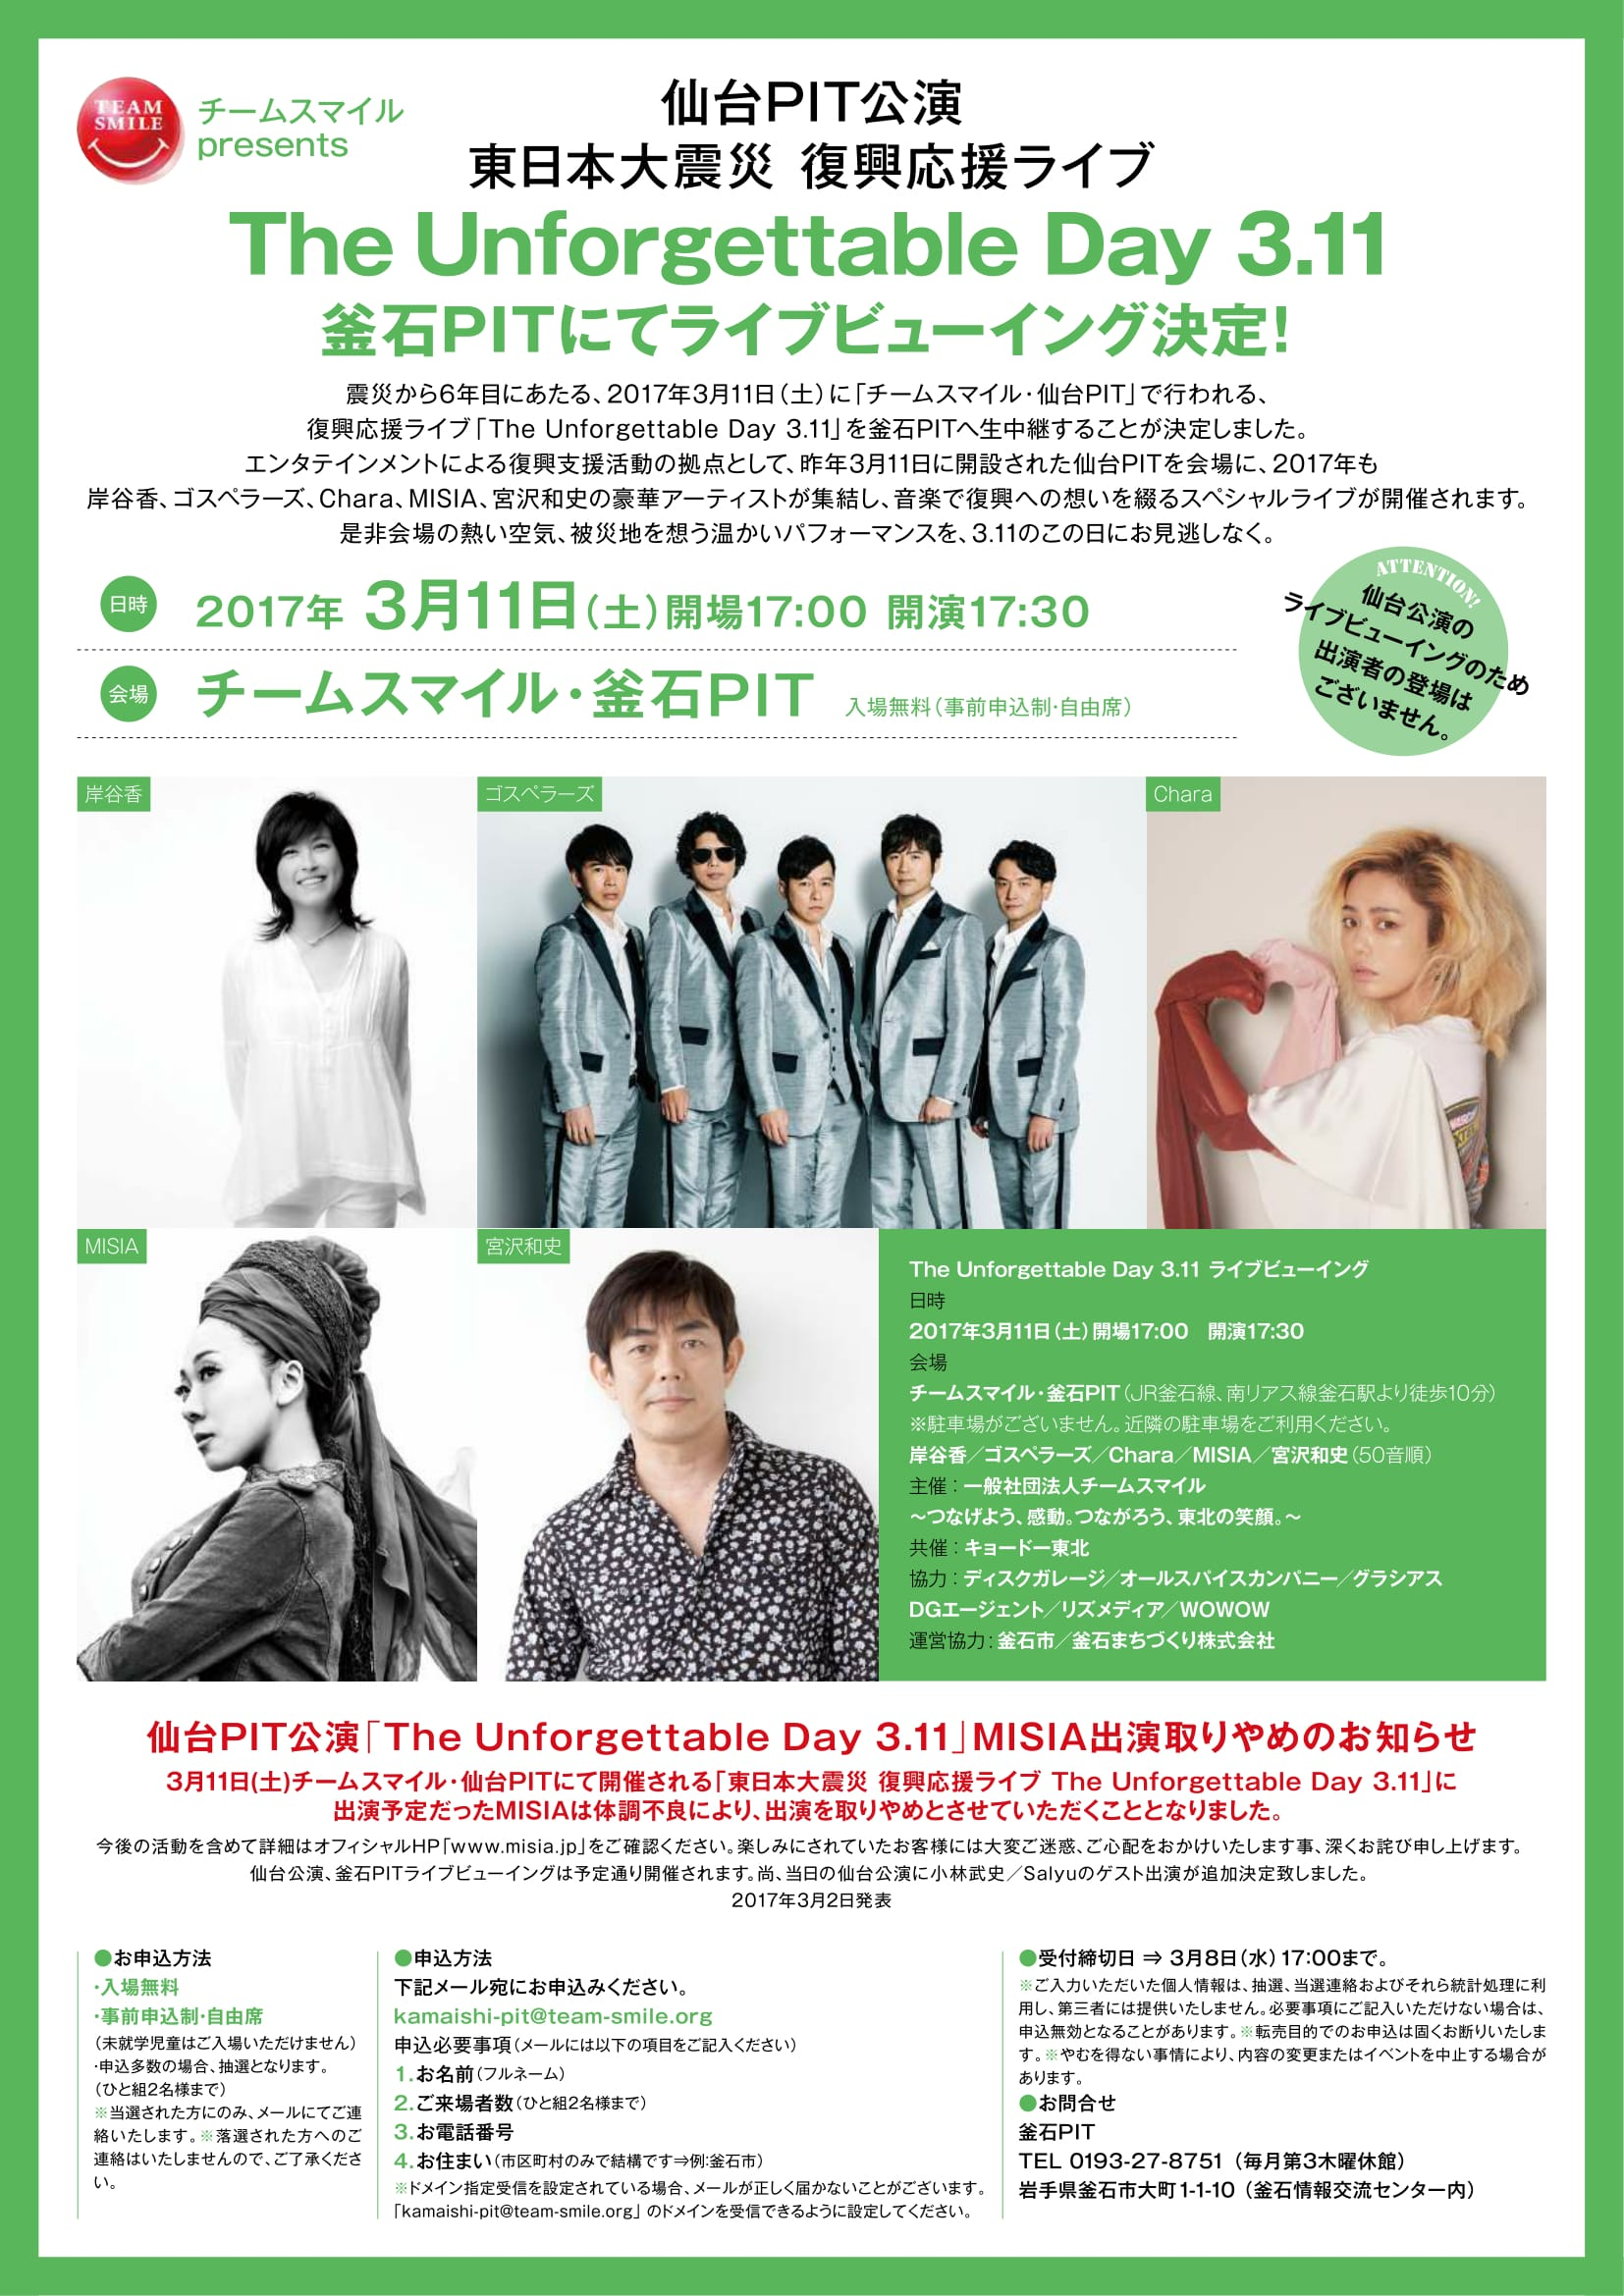 The Unforgettable Day 3.11 ライブビューイング@釜石PIT (修正版)